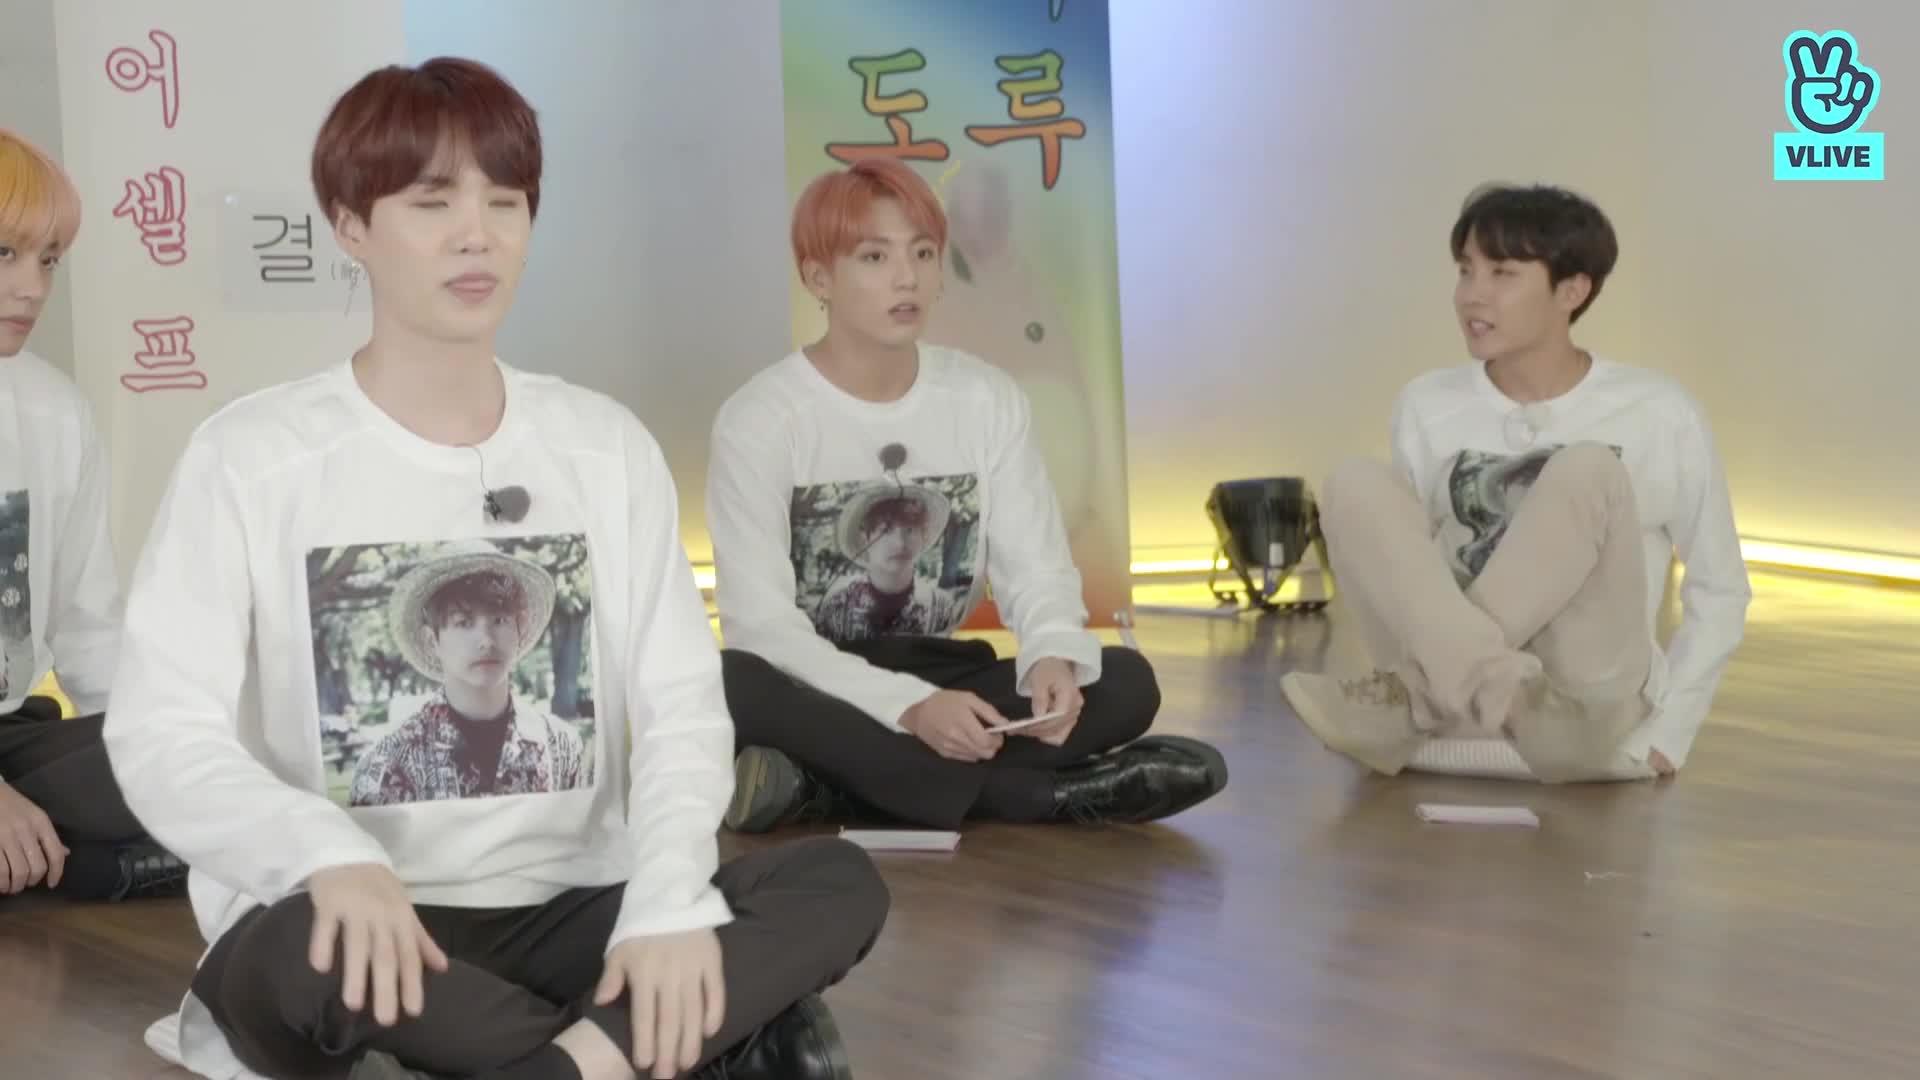 [BTS] 대혼란의 텔레사피 얼쑤〰️ 지화자 좋다🎶 (BTS playing telepathy game)